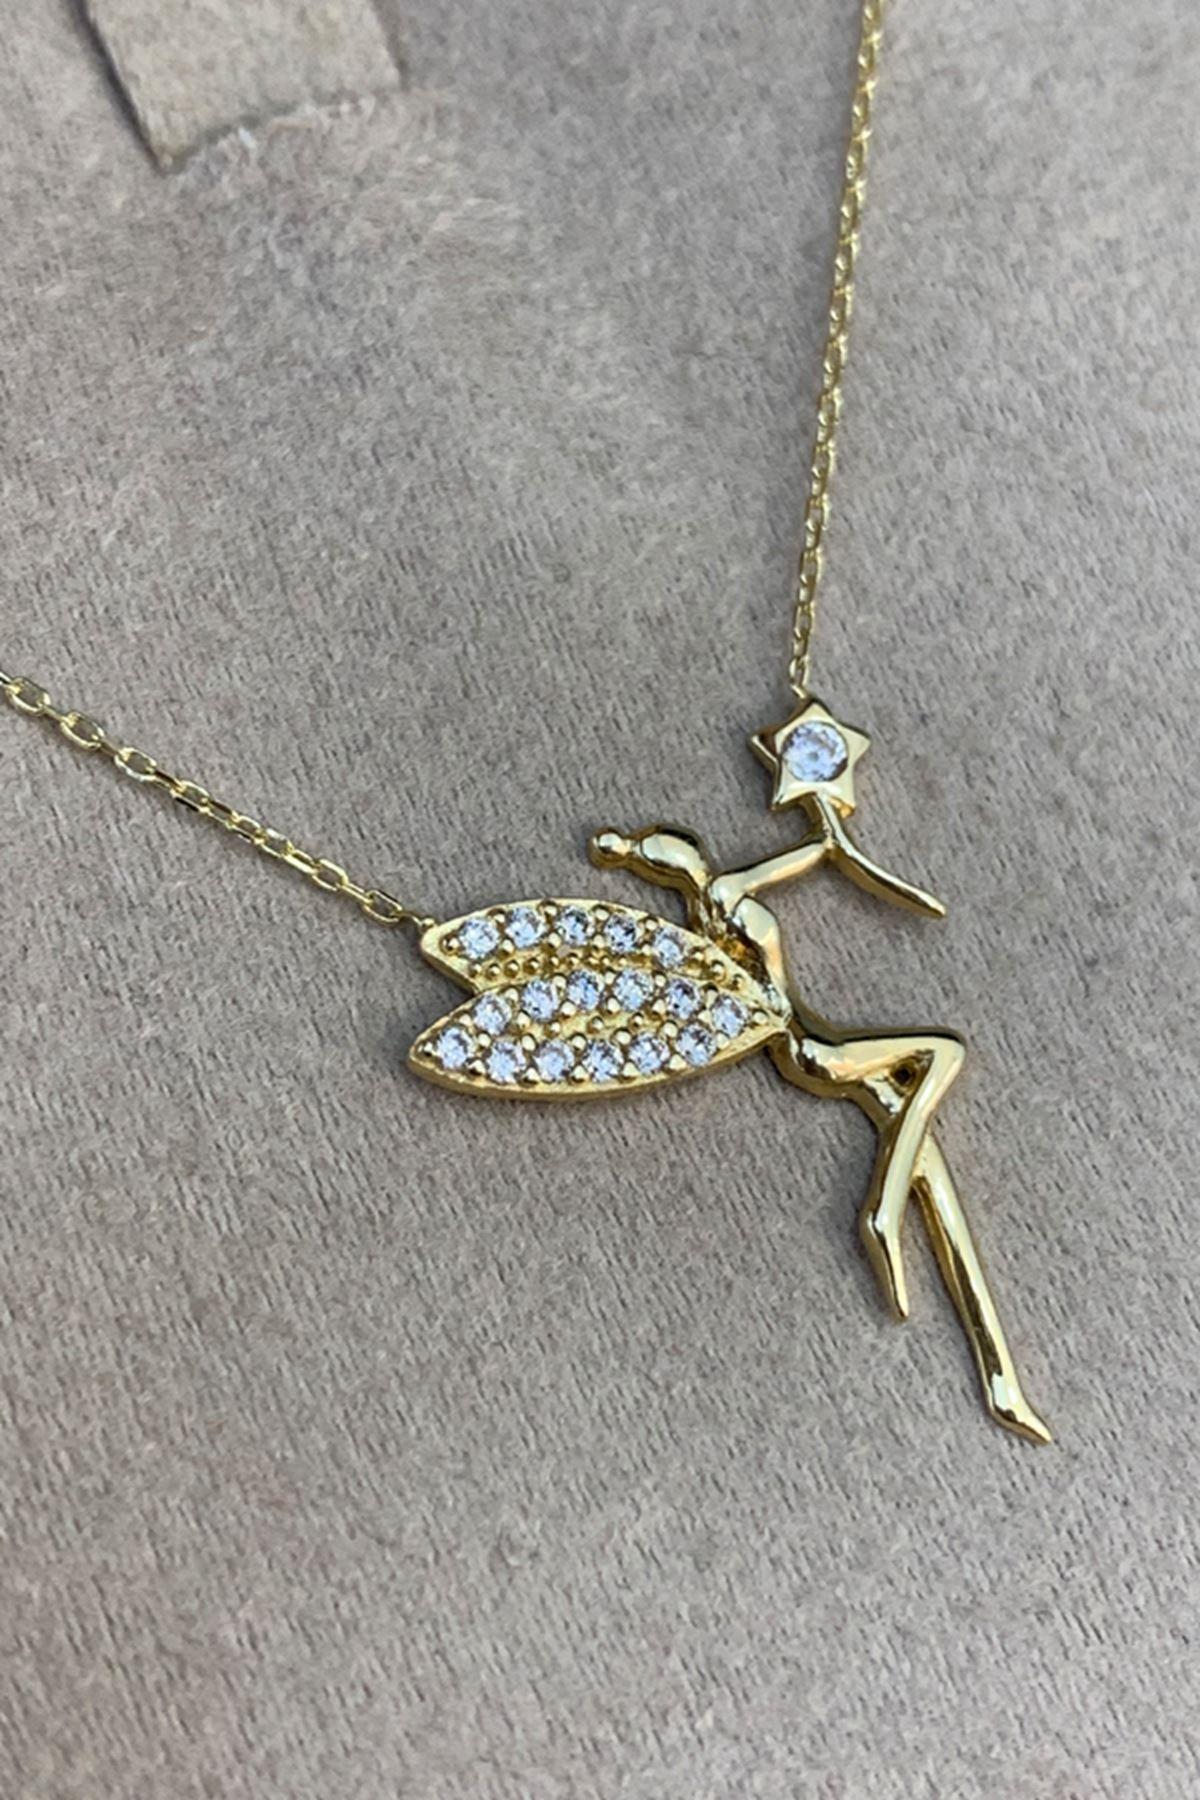 Peri Kız Altın Kolye KL0082